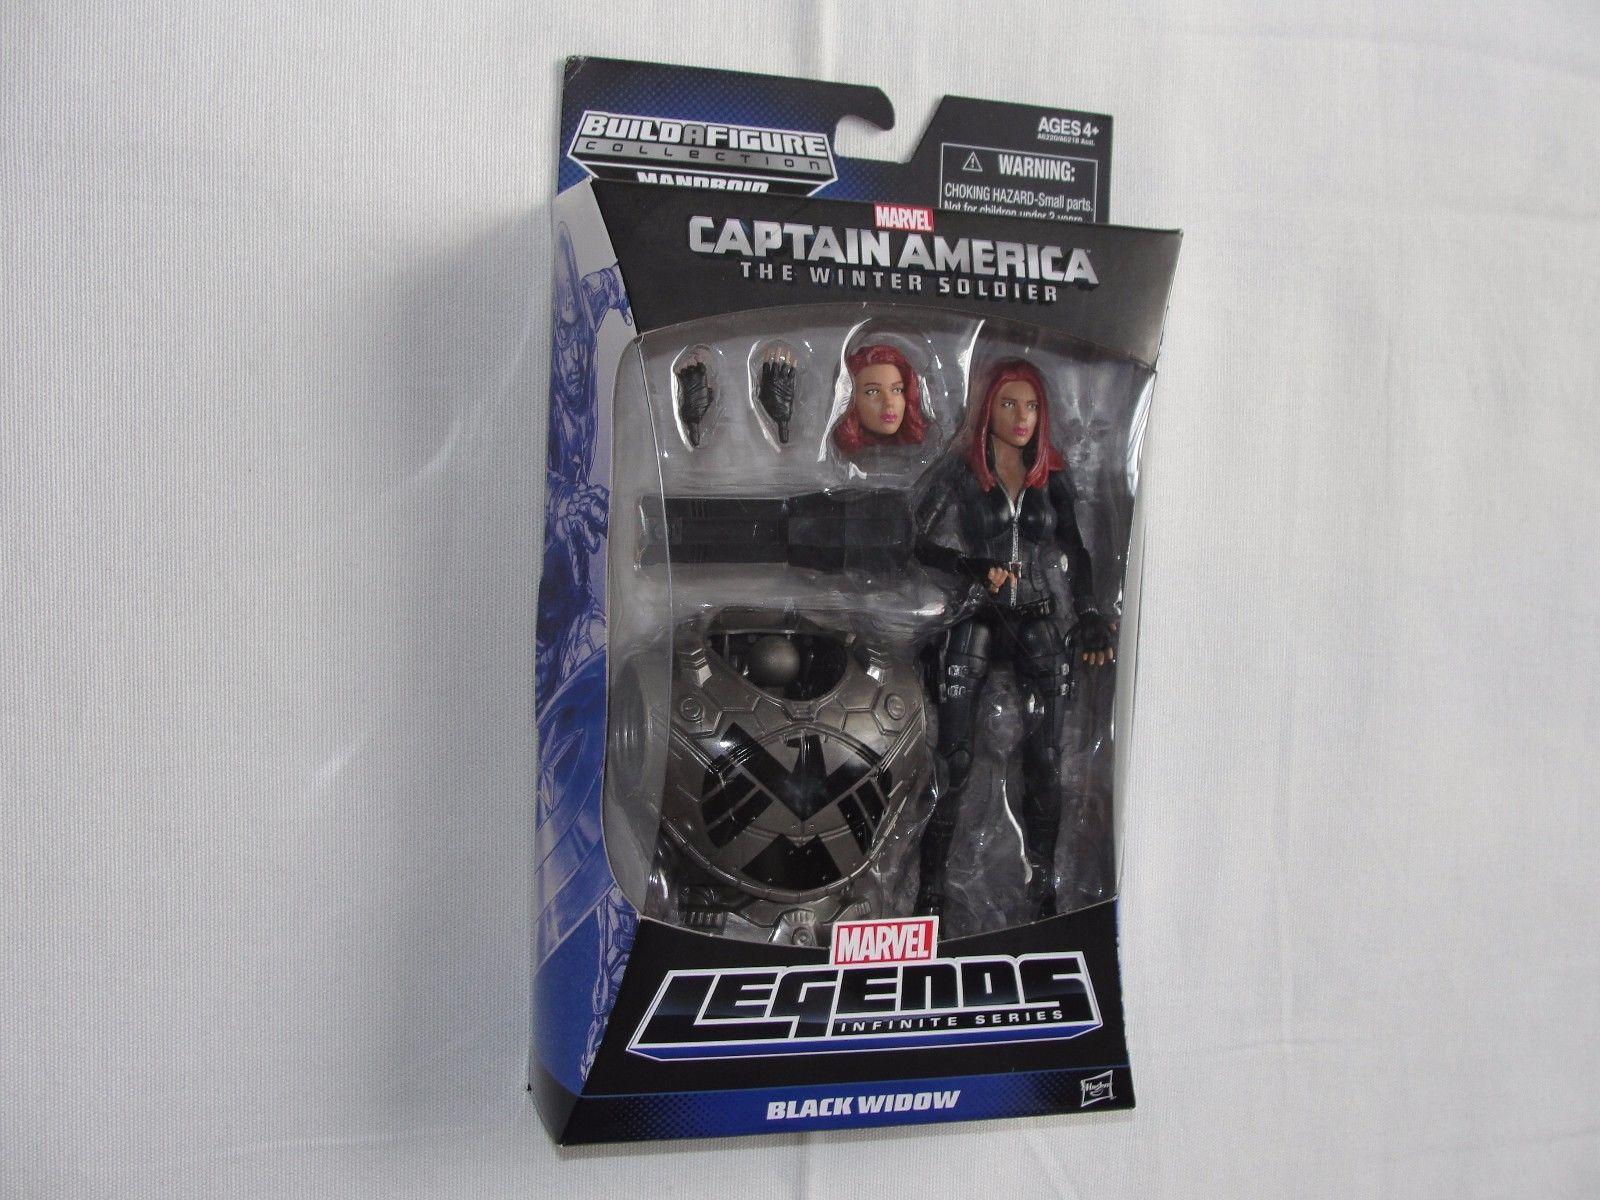 BLACK WIDOW Marvel Legends Infinite series CAPTAIN AMERICA Build A Figure New